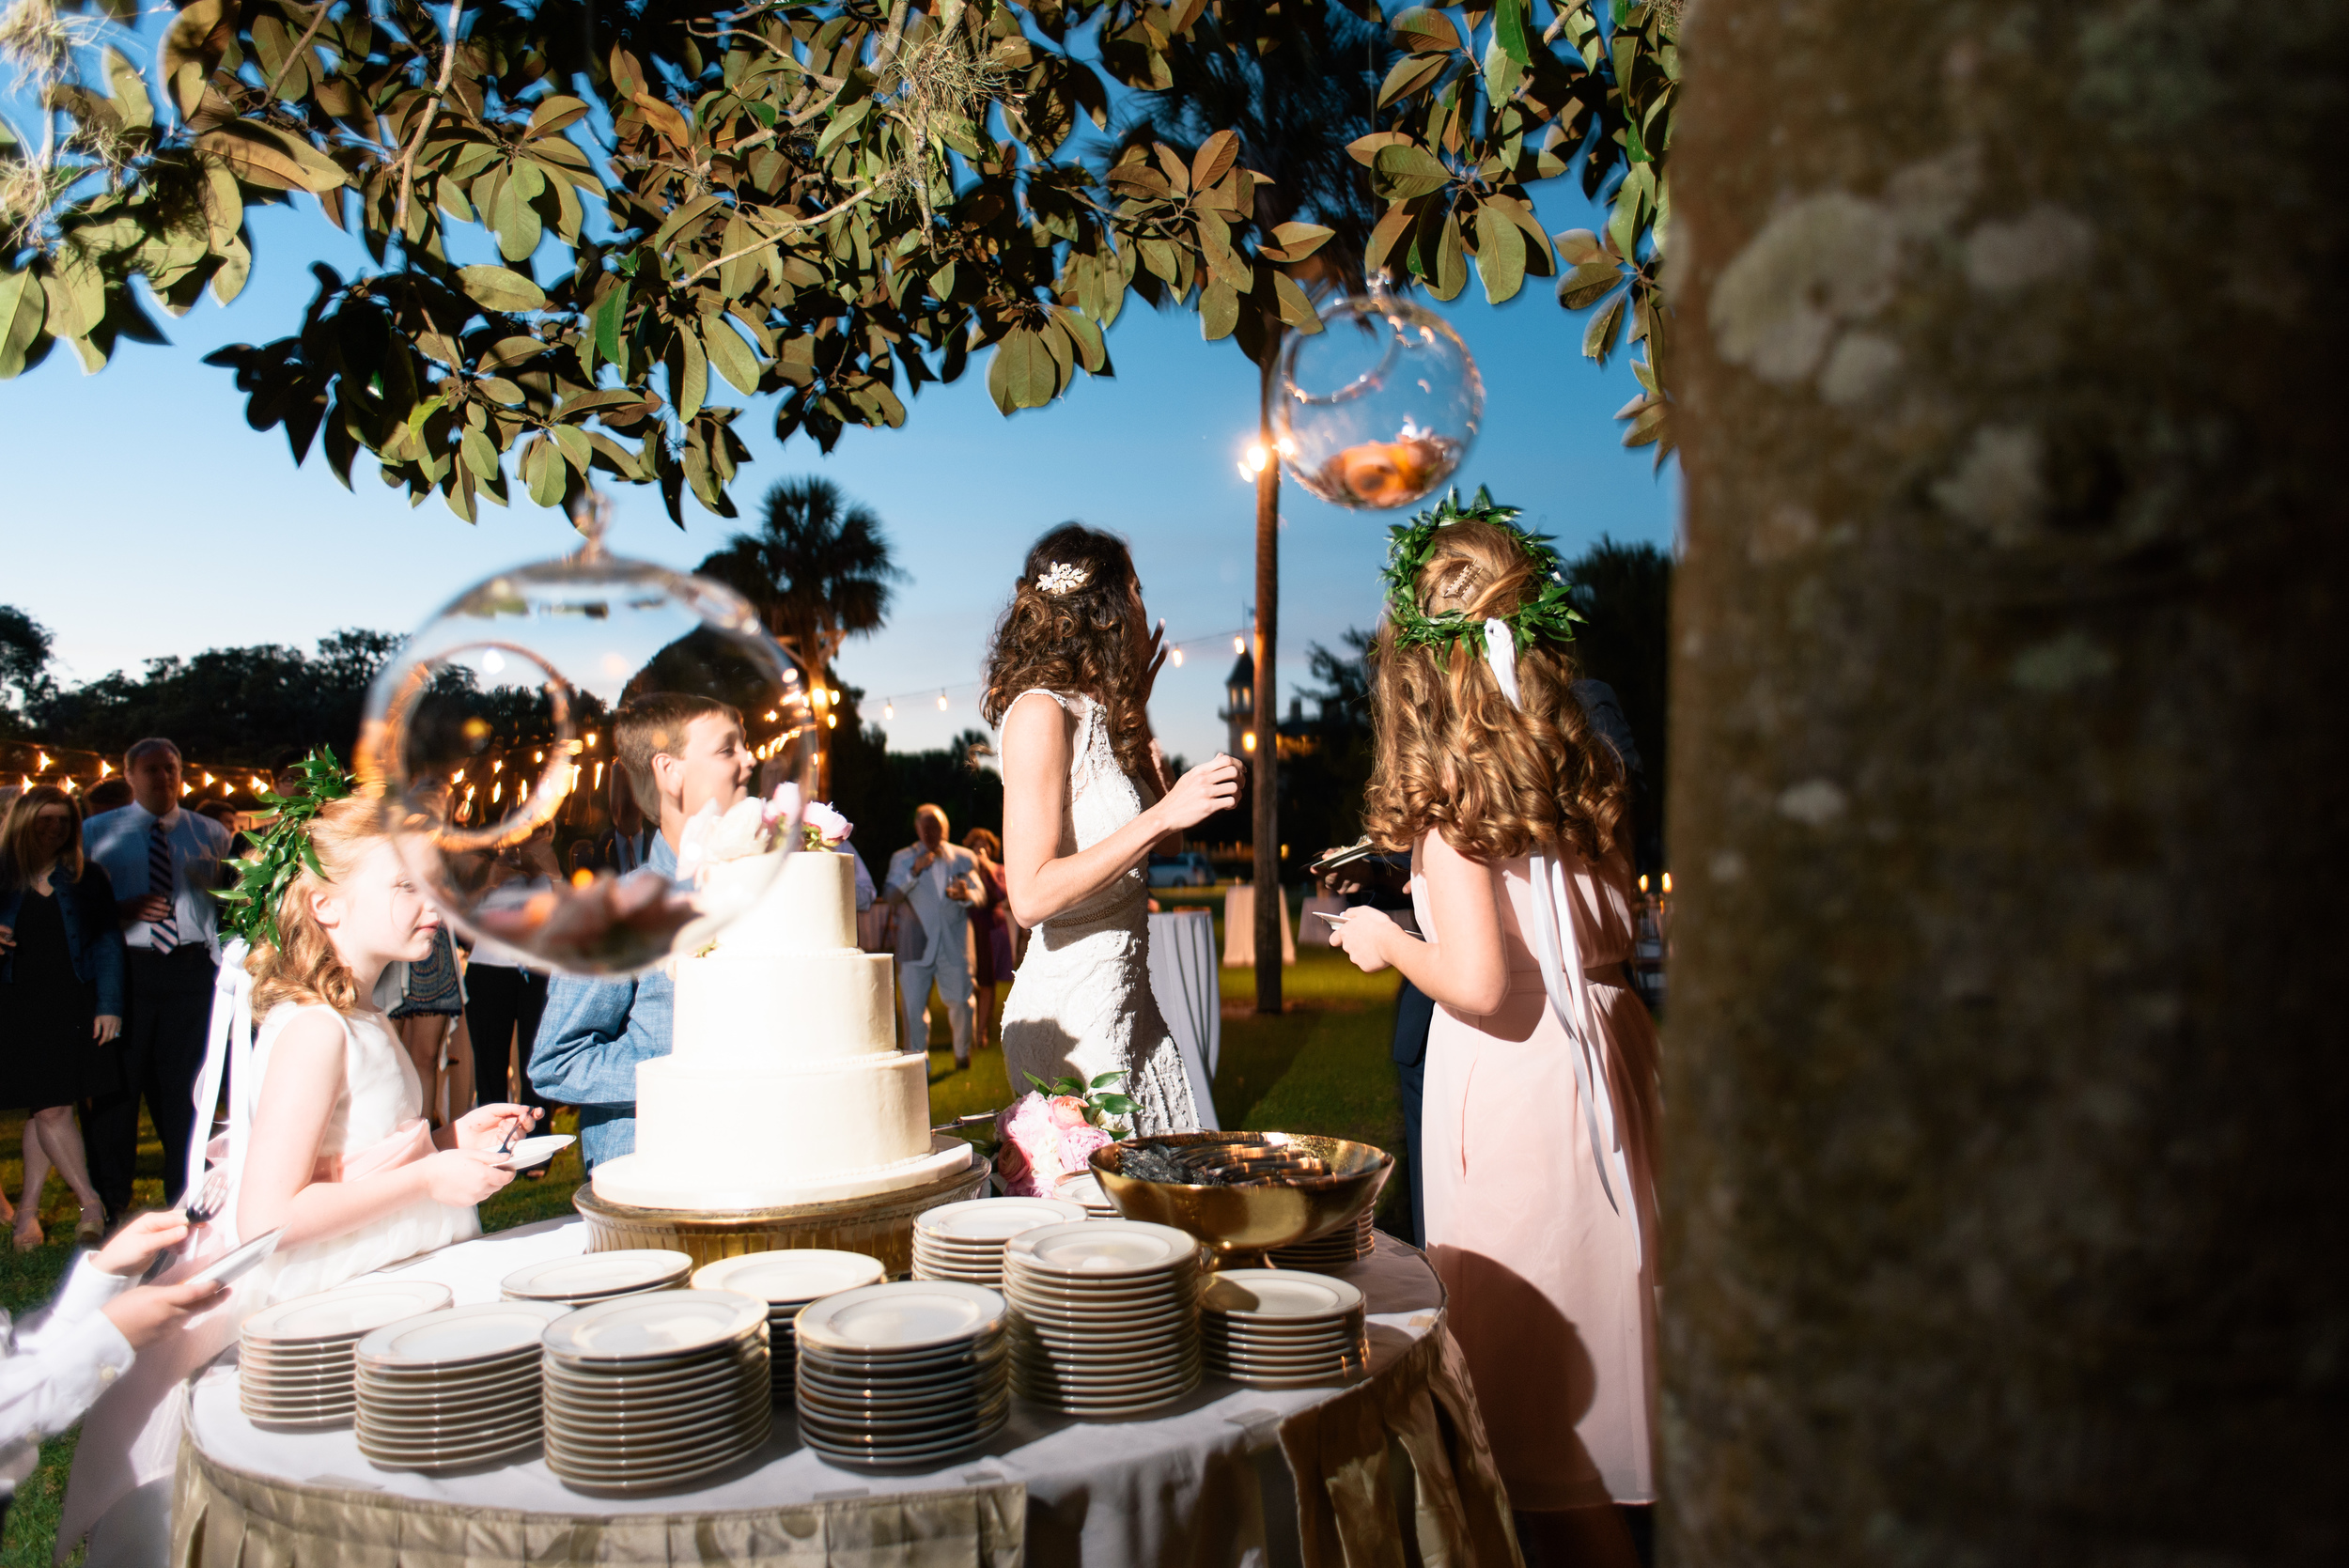 kadi-and-matt-carroll-april-9-2016-jekyl-island-wedding-m-newsom-photography- (374 of 484).jpg